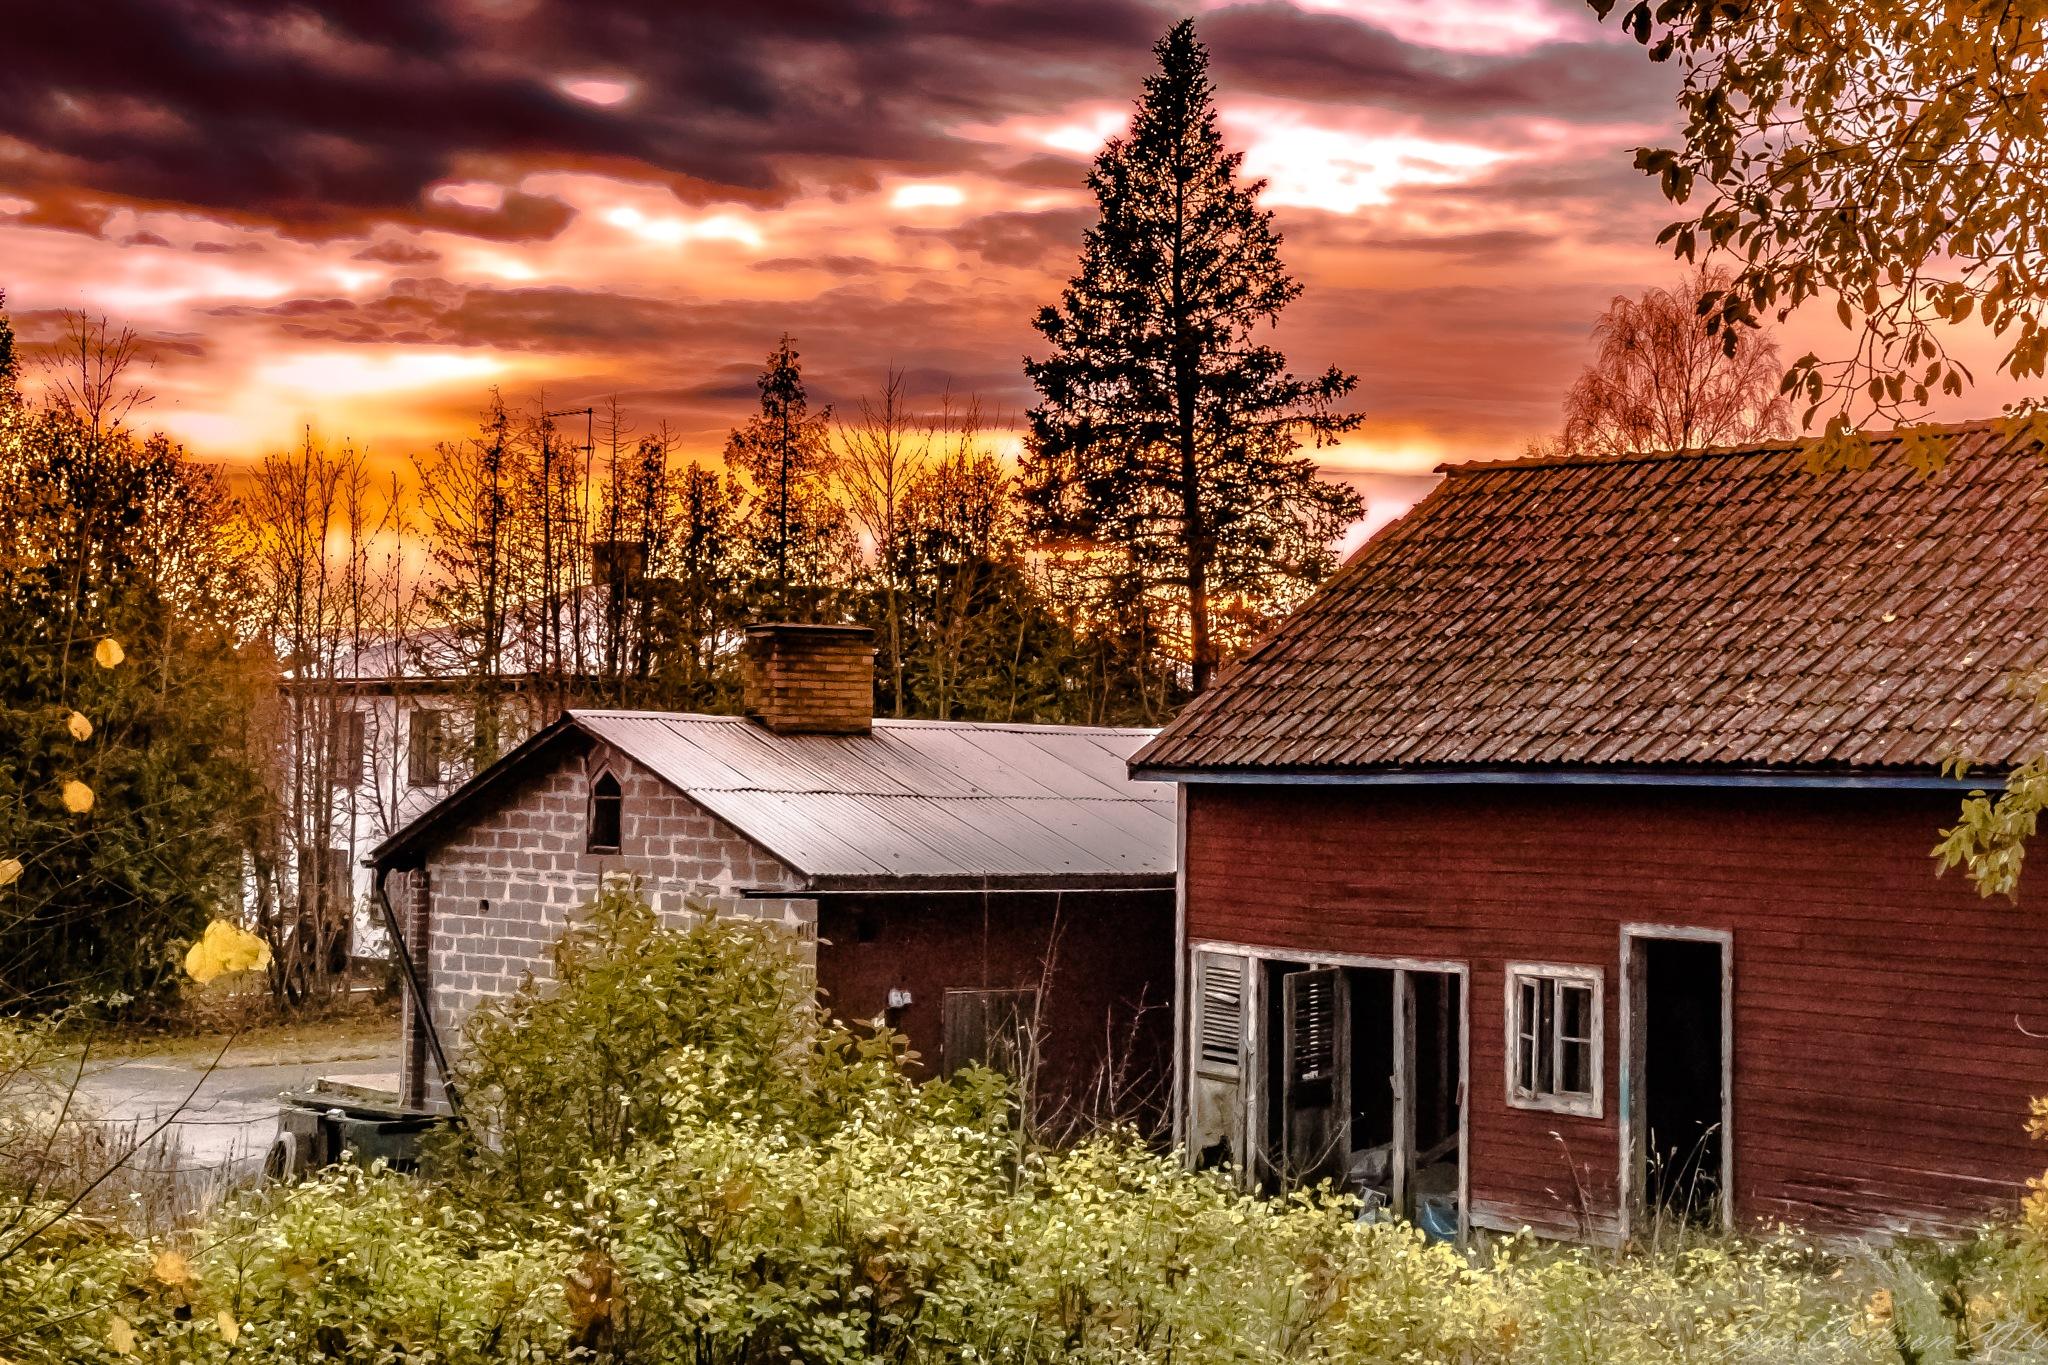 October Countryside Sunset by carljan w carlsson